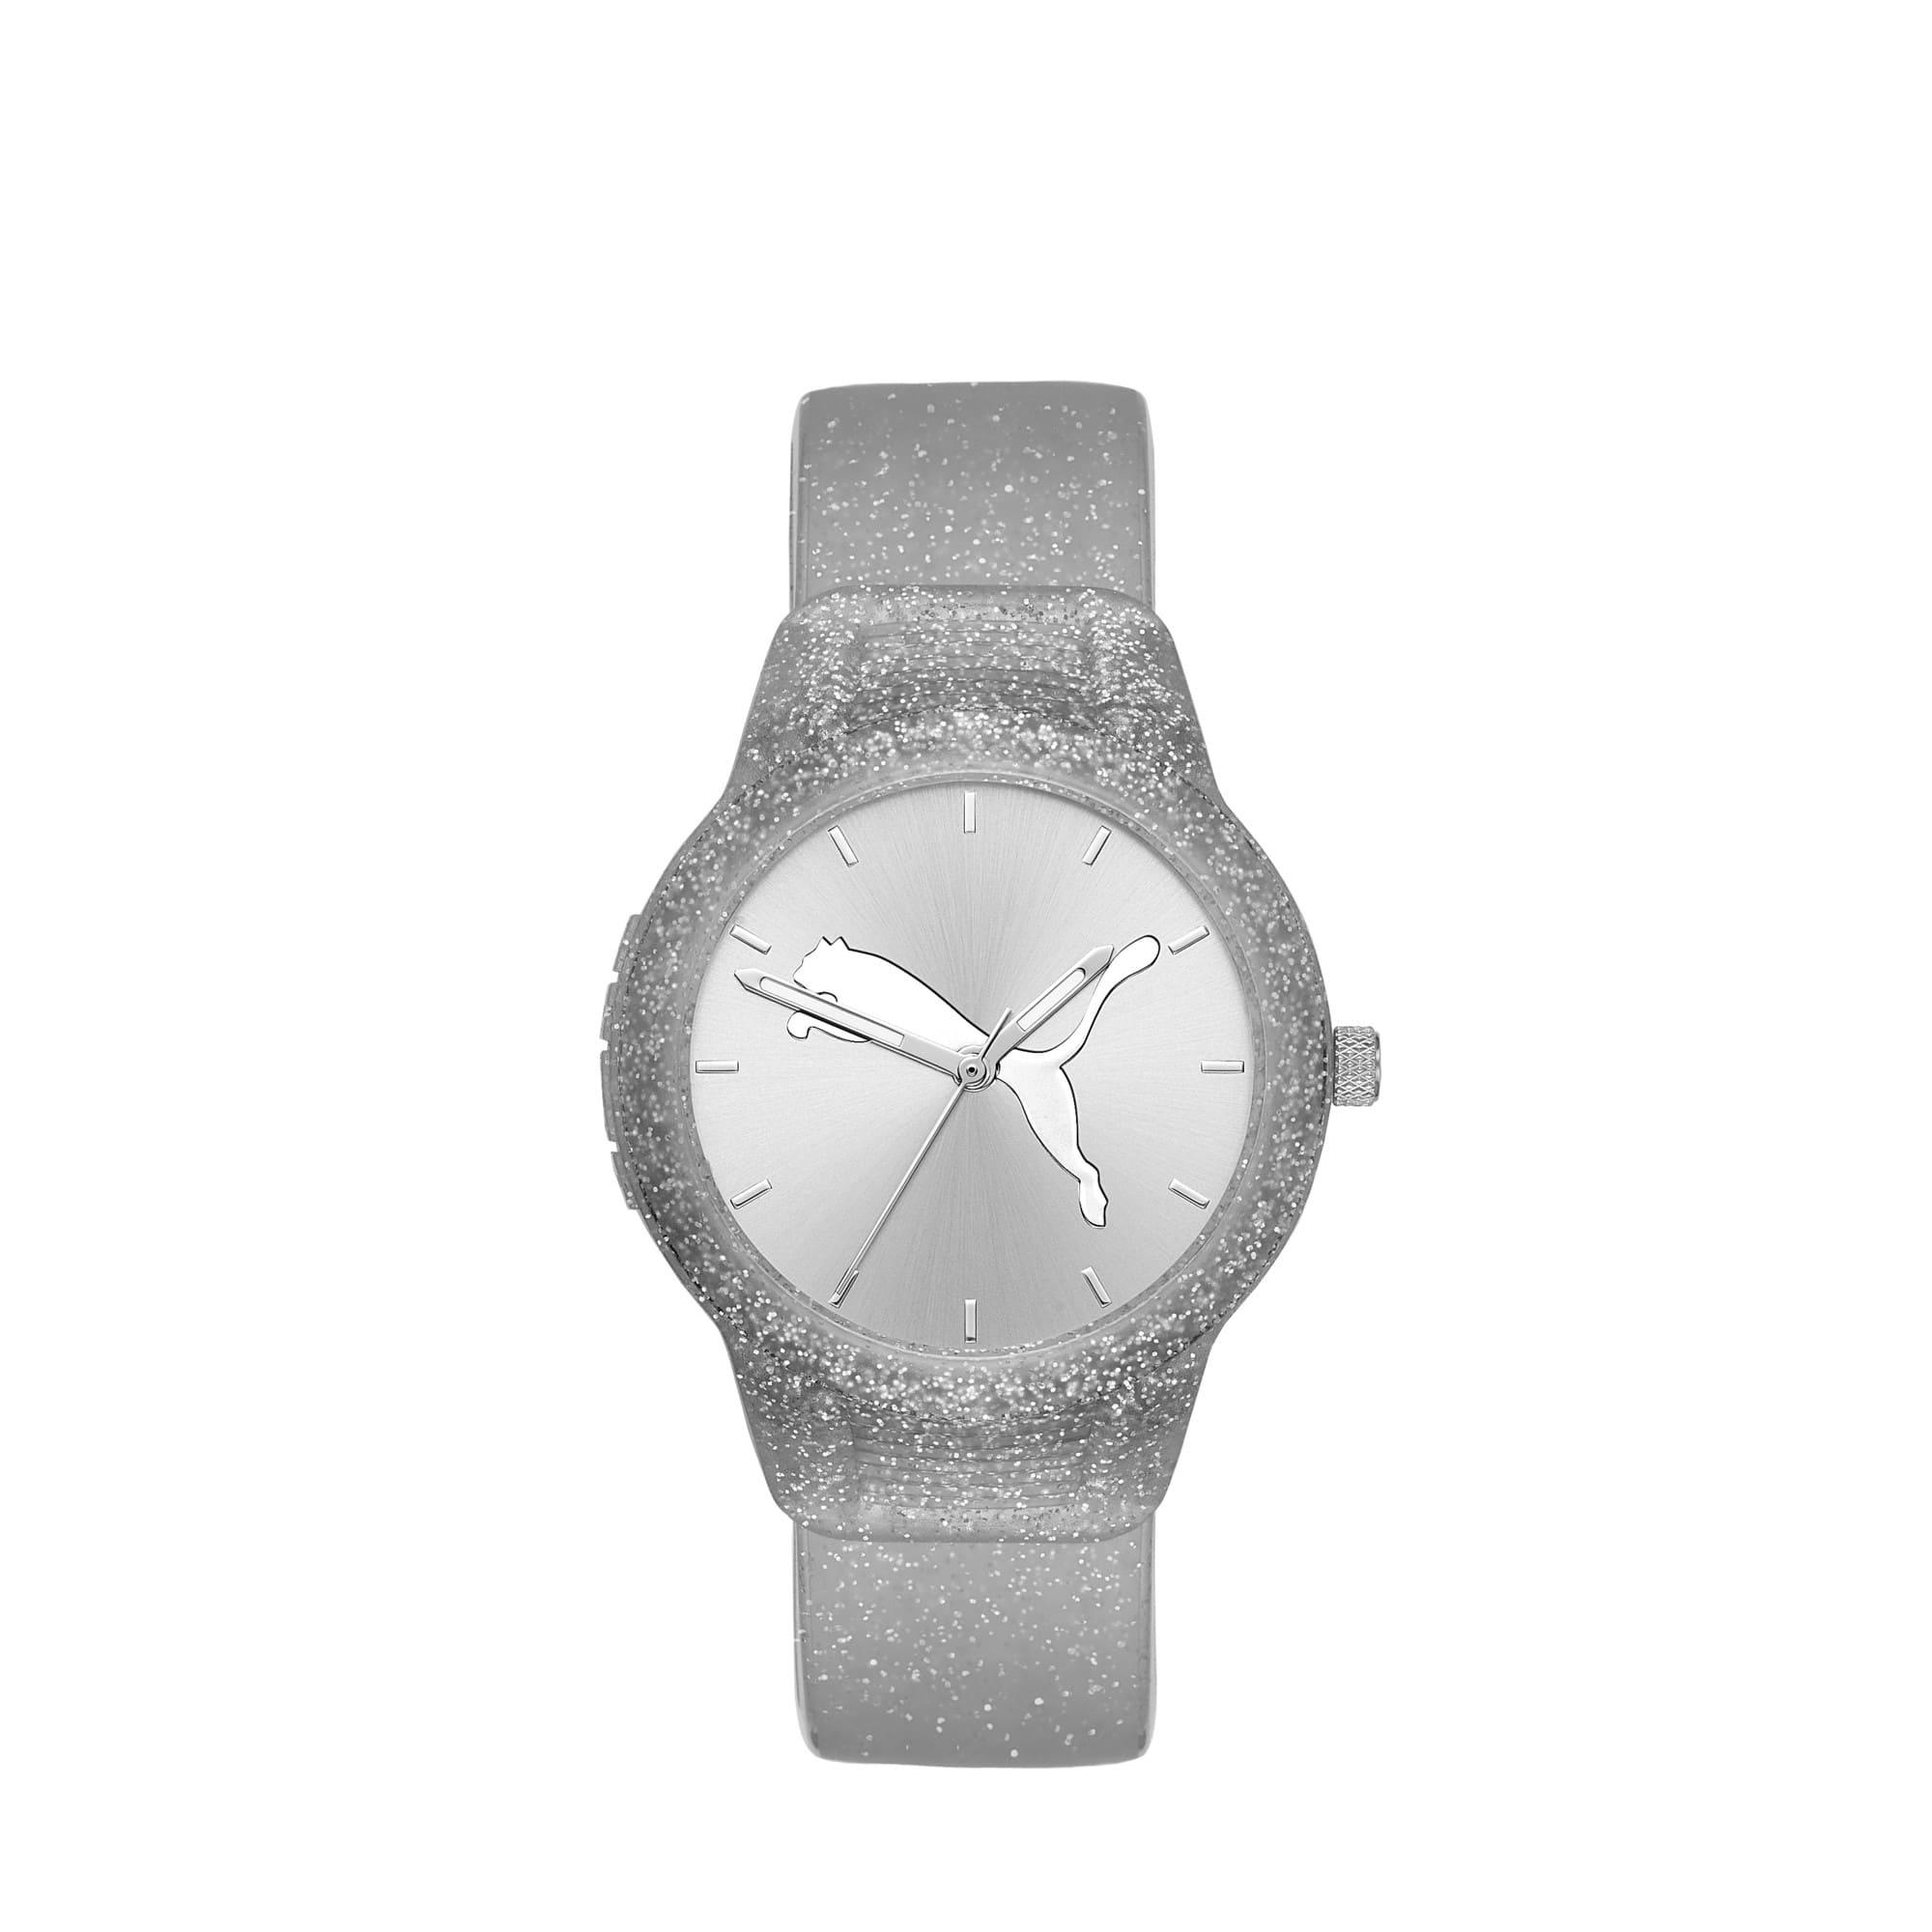 Thumbnail 1 of Reset v2 Watch, Silver/Silver, medium